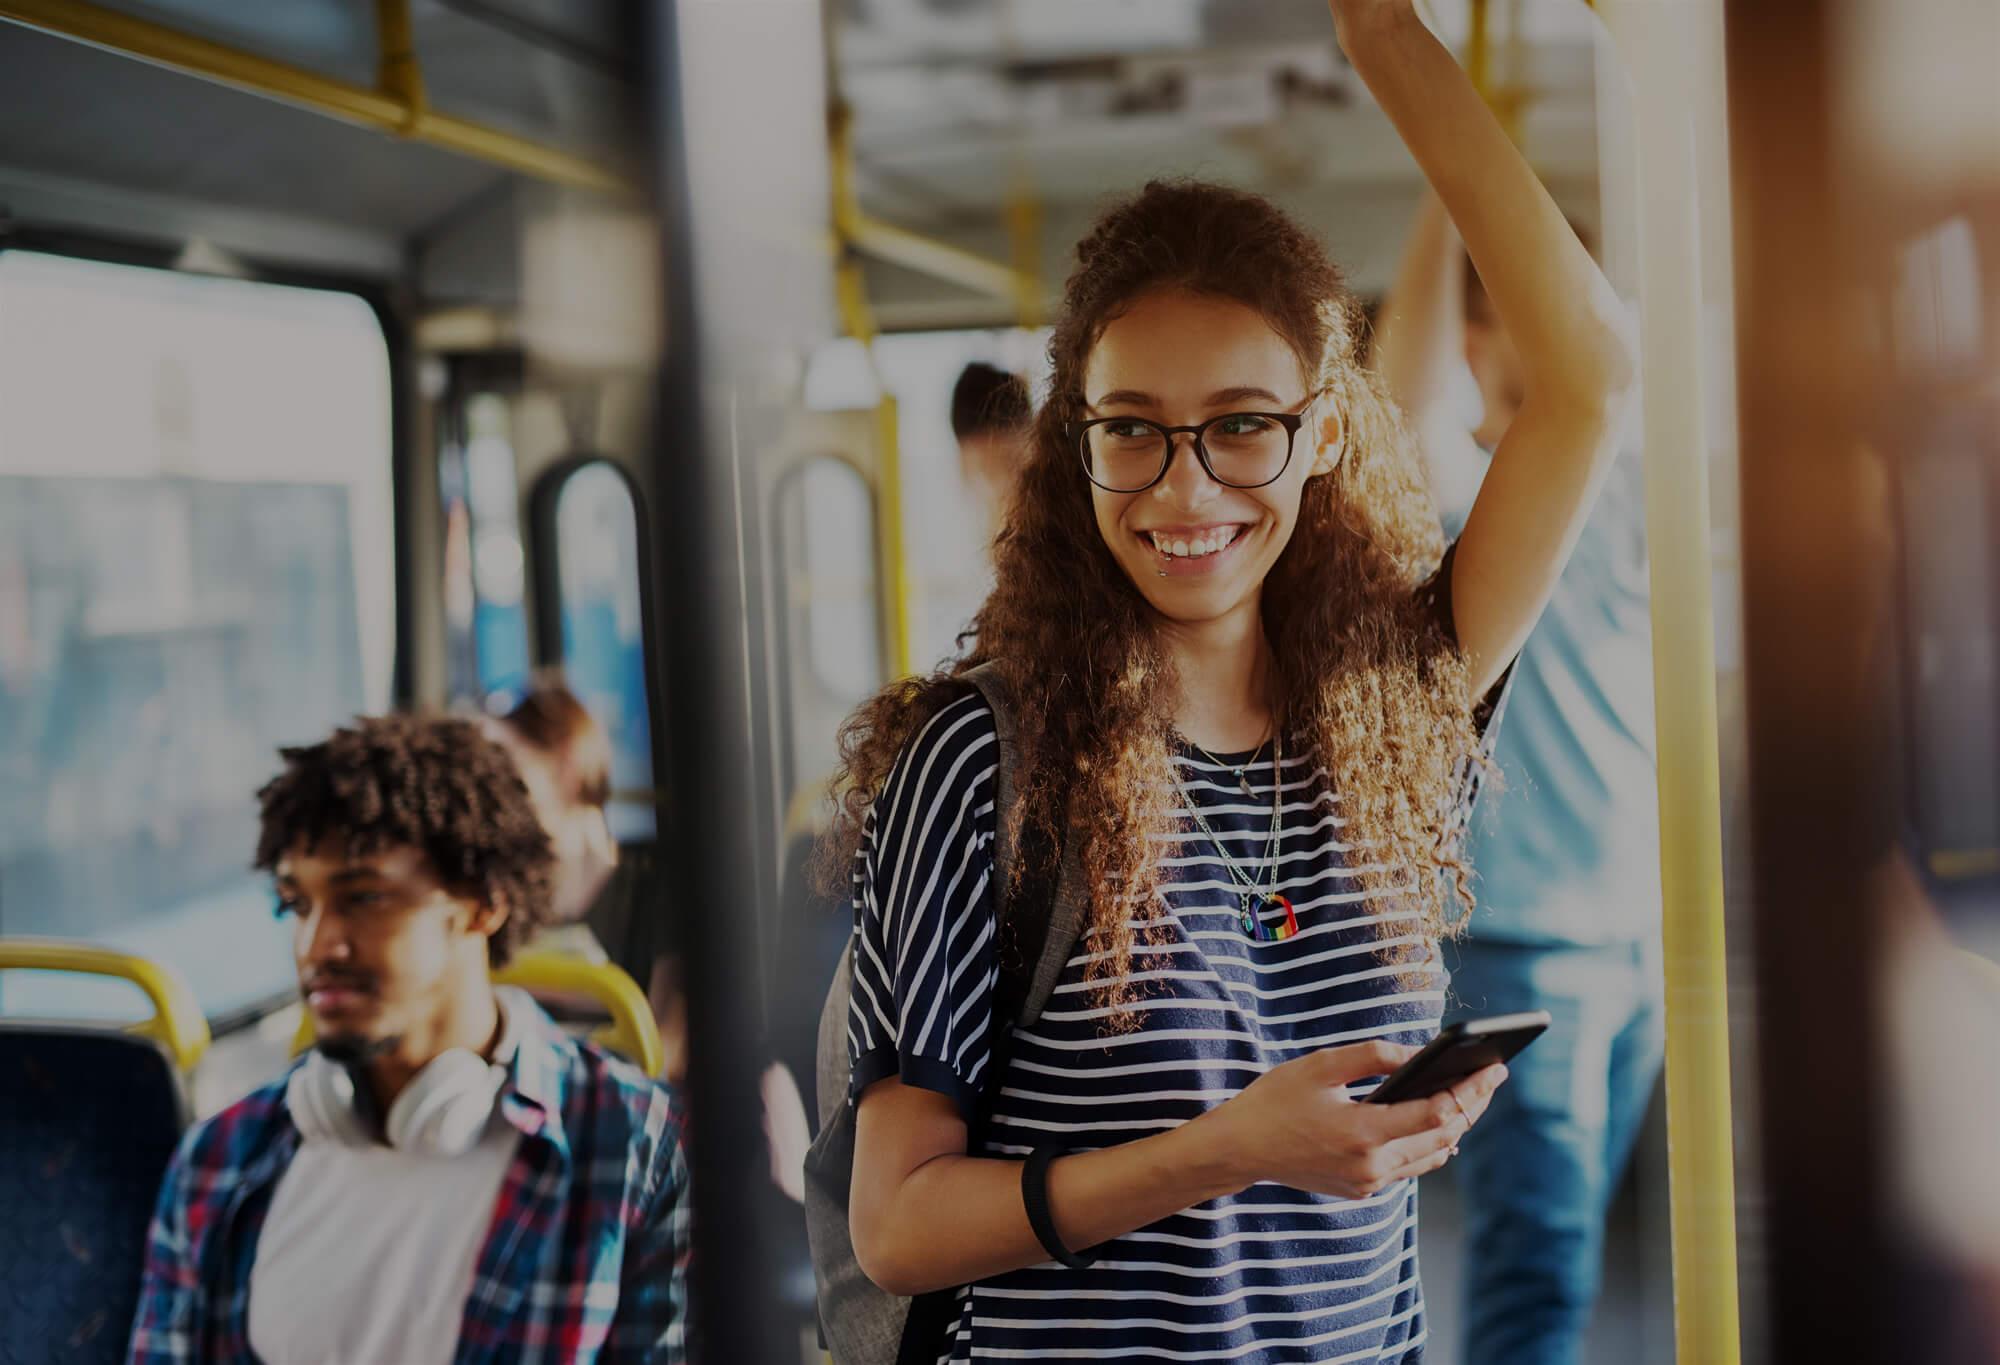 Pole emploi - offre emploi Operateur de ligne (H/F) - Beautiran